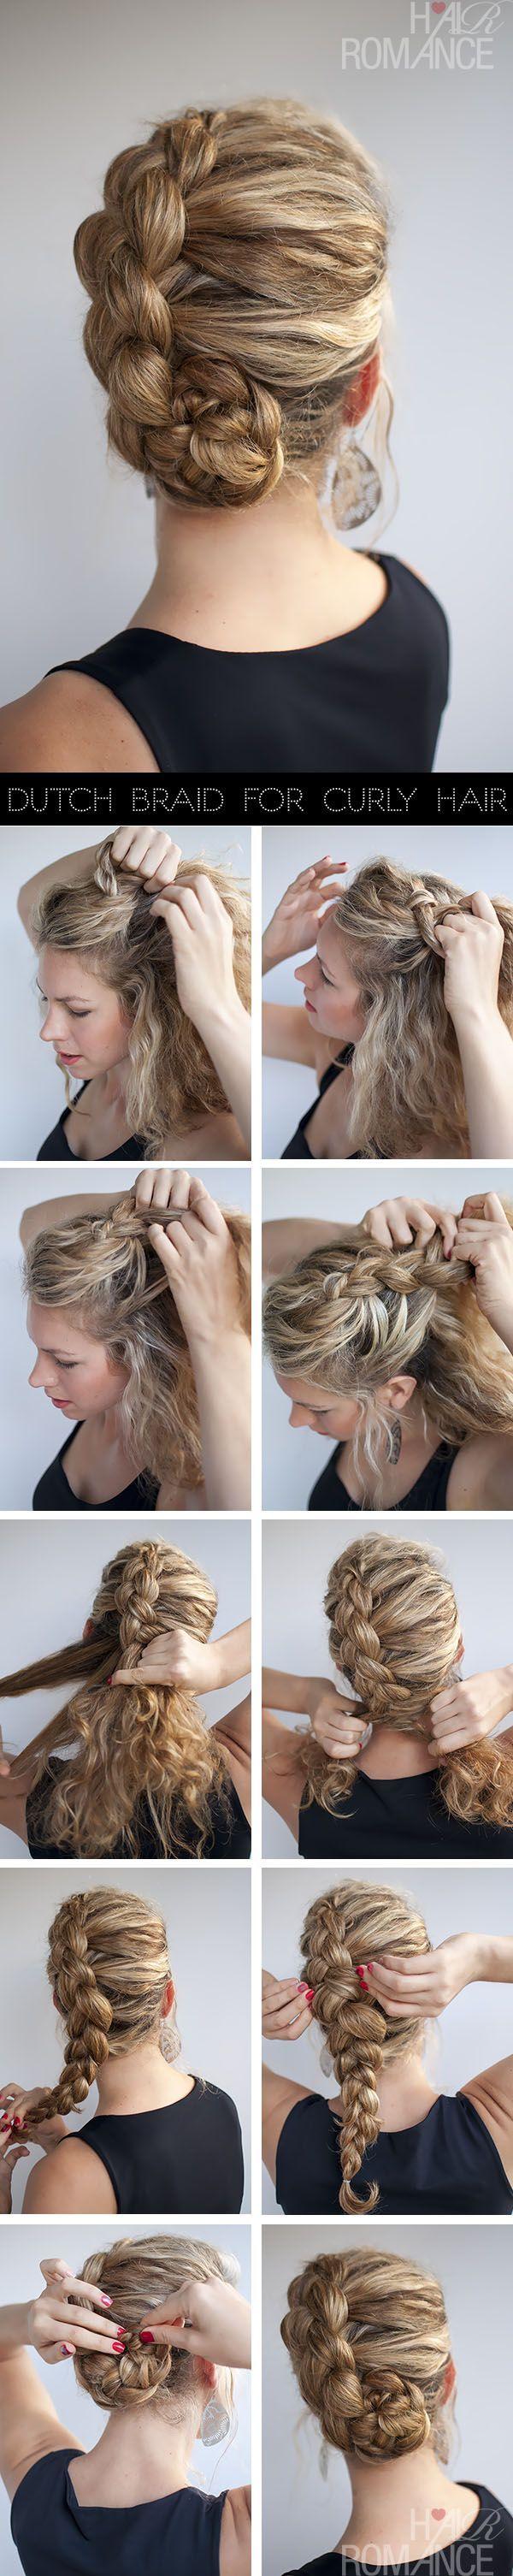 best hair images on pinterest hair styles hair cut and hair cuts